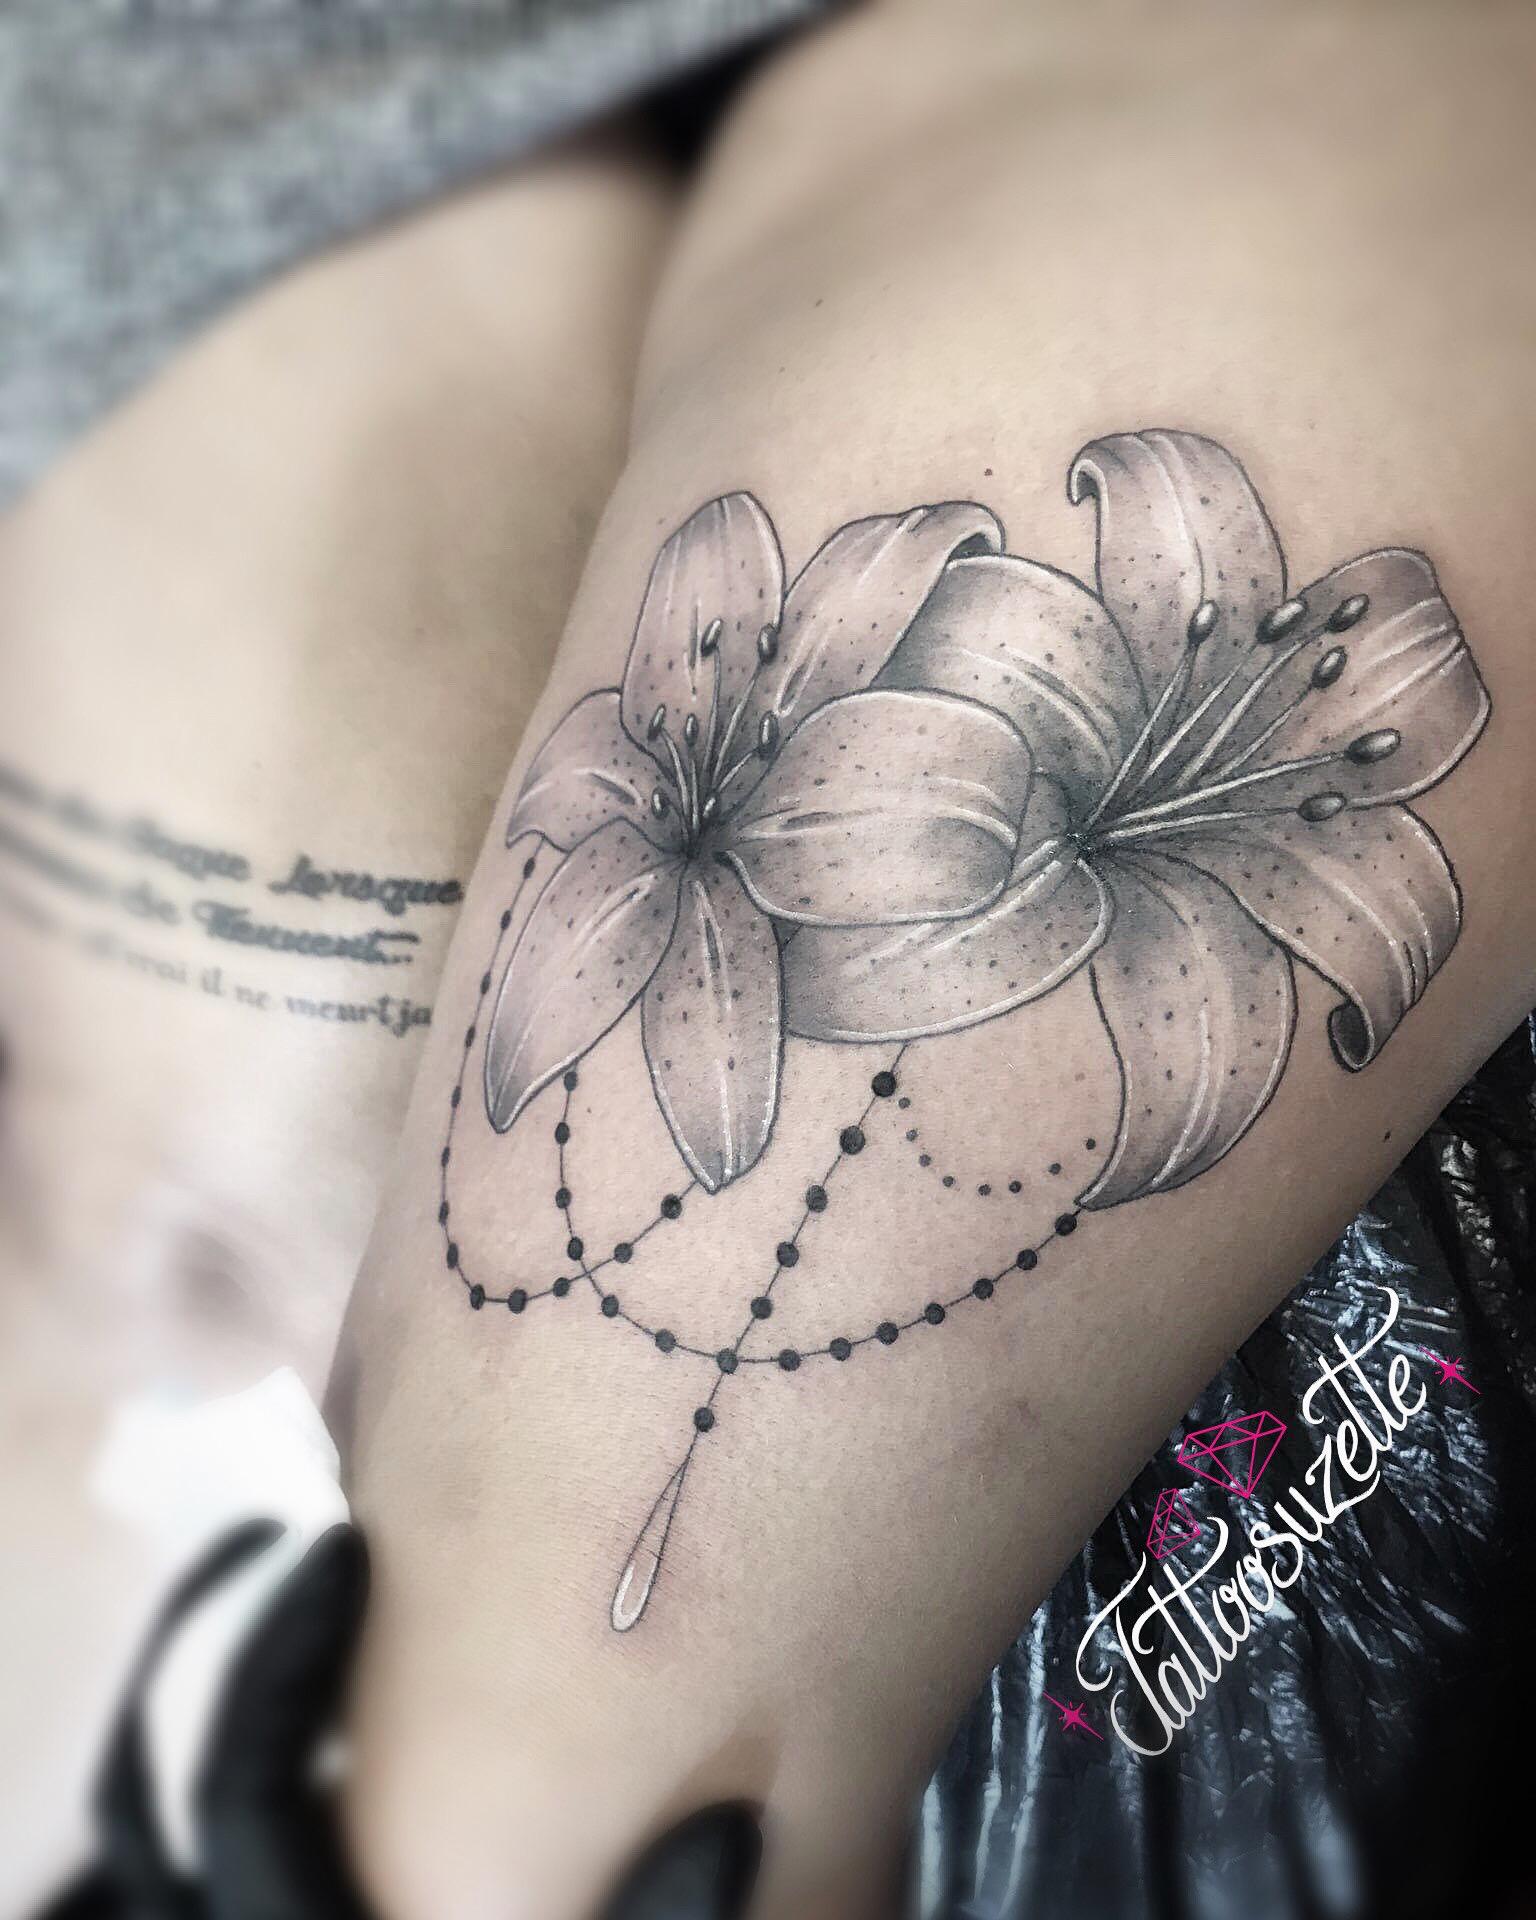 Tatouage Fleurs De Lys By Tattoosuzette On Deviantart